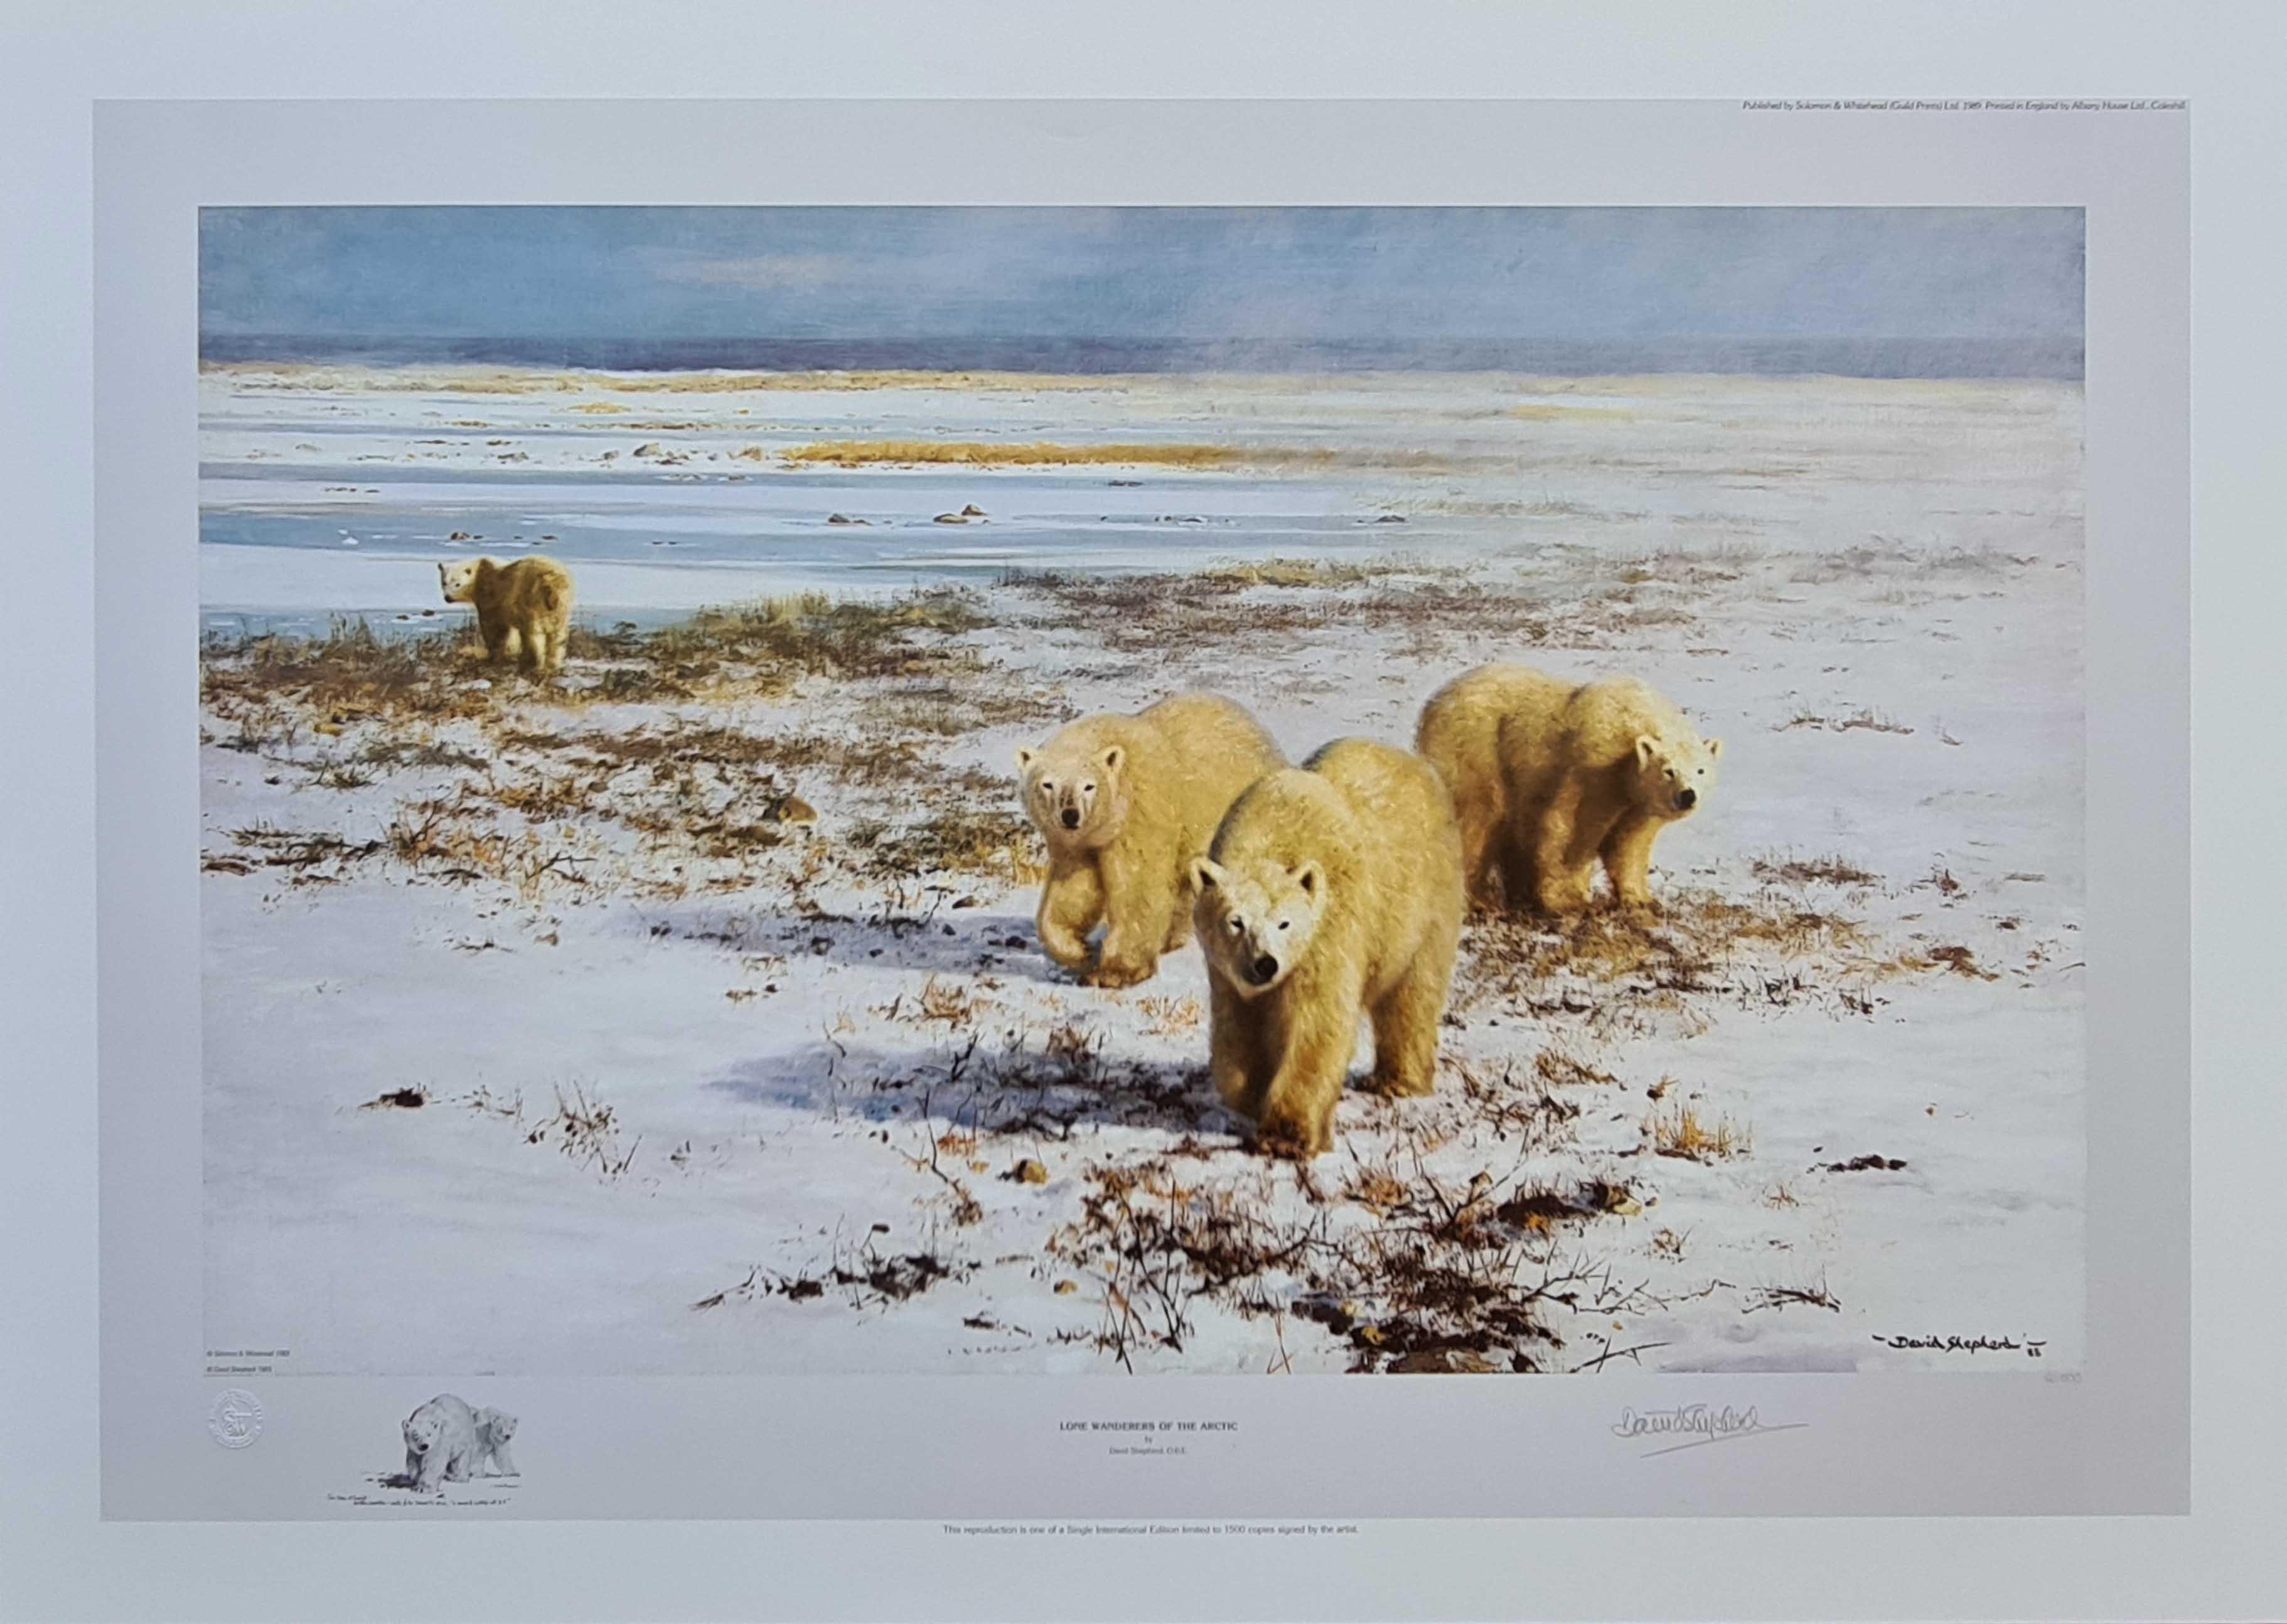 shepherd lone wanders of the arctic polar bears